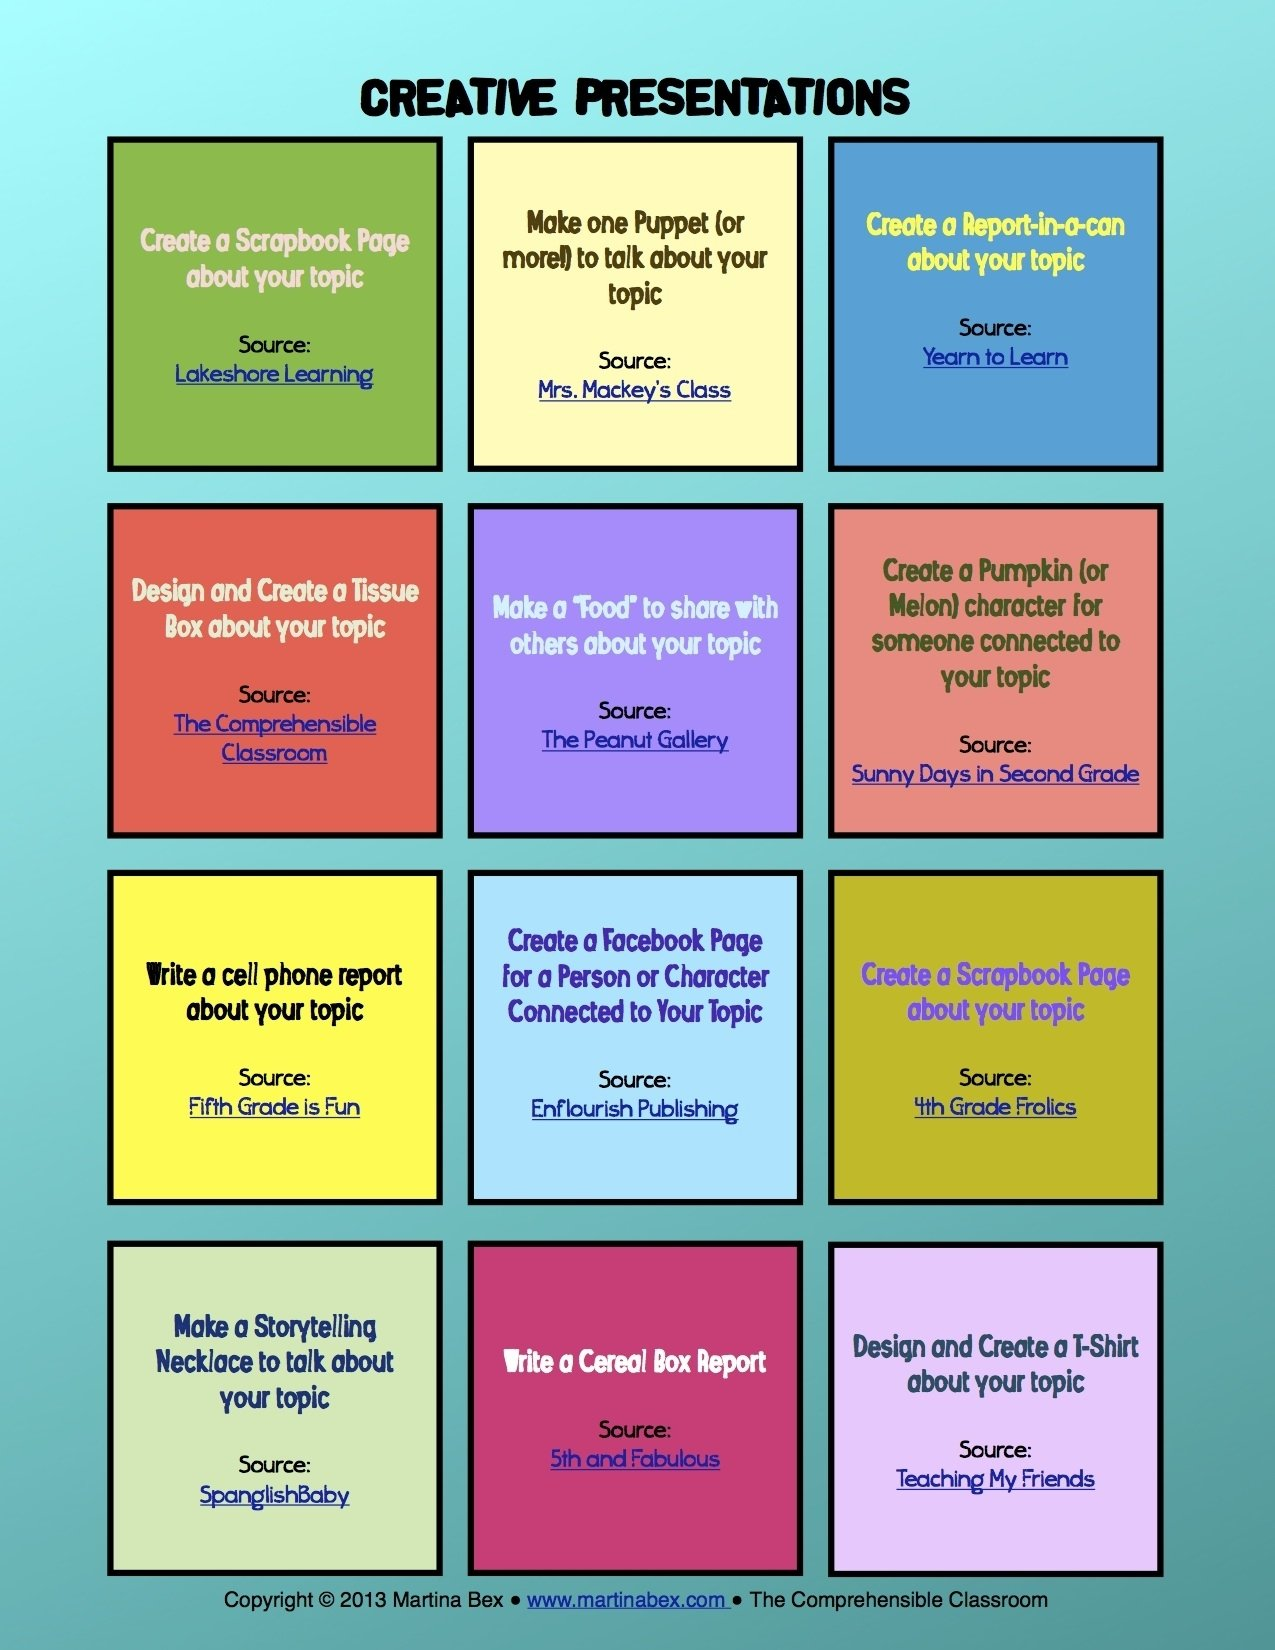 10 Stunning Creative Presentation Ideas For School creative presentation ideas the comprehensible classroom 1 2021